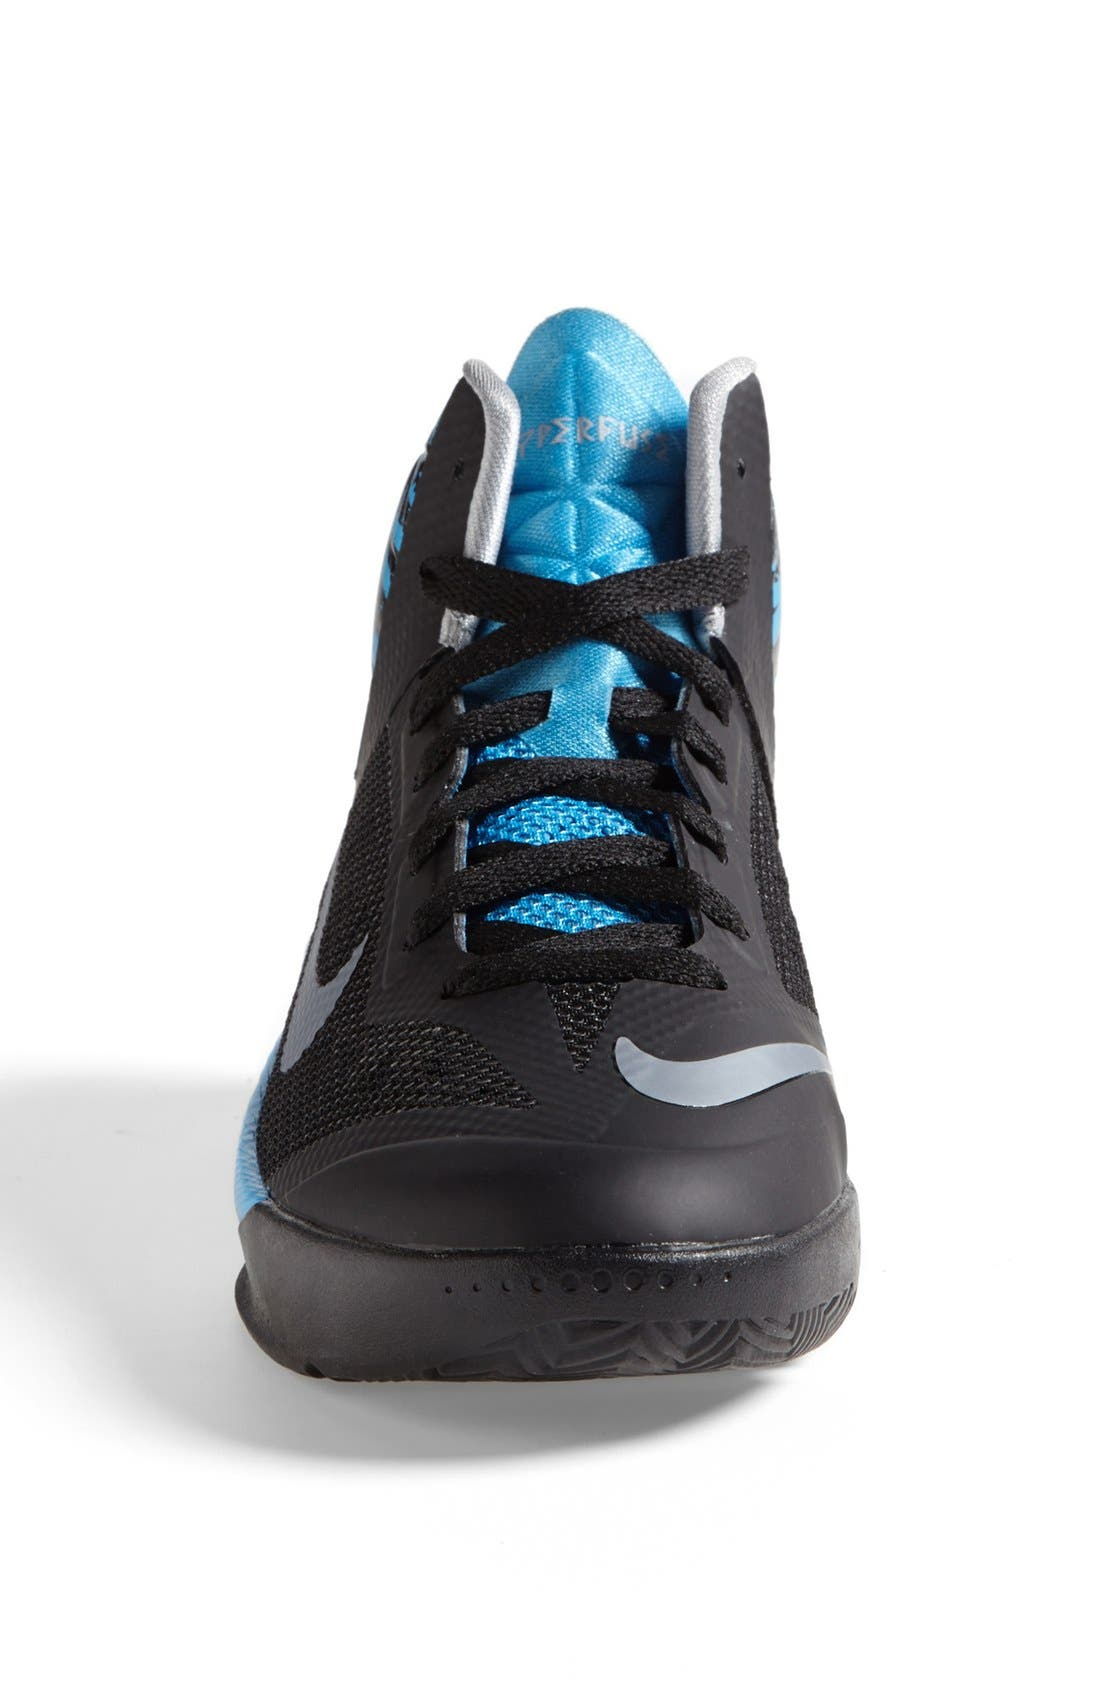 Alternate Image 3  - Nike 'Hyperfuse 2013' Basketball Shoe (Big Kid)